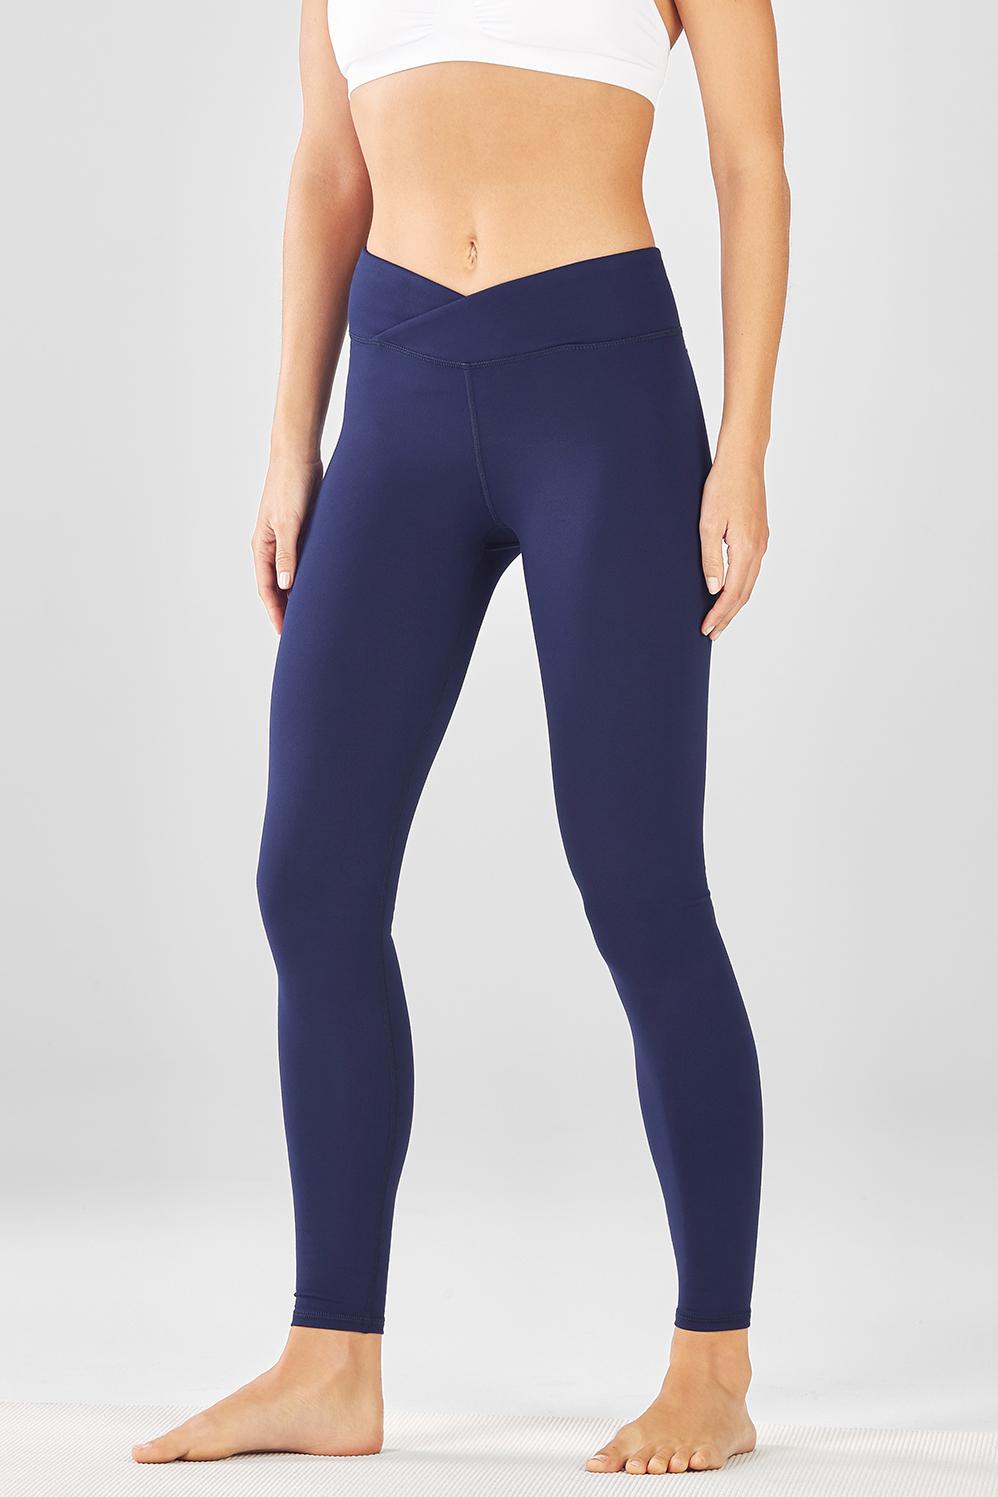 legging bleu marine